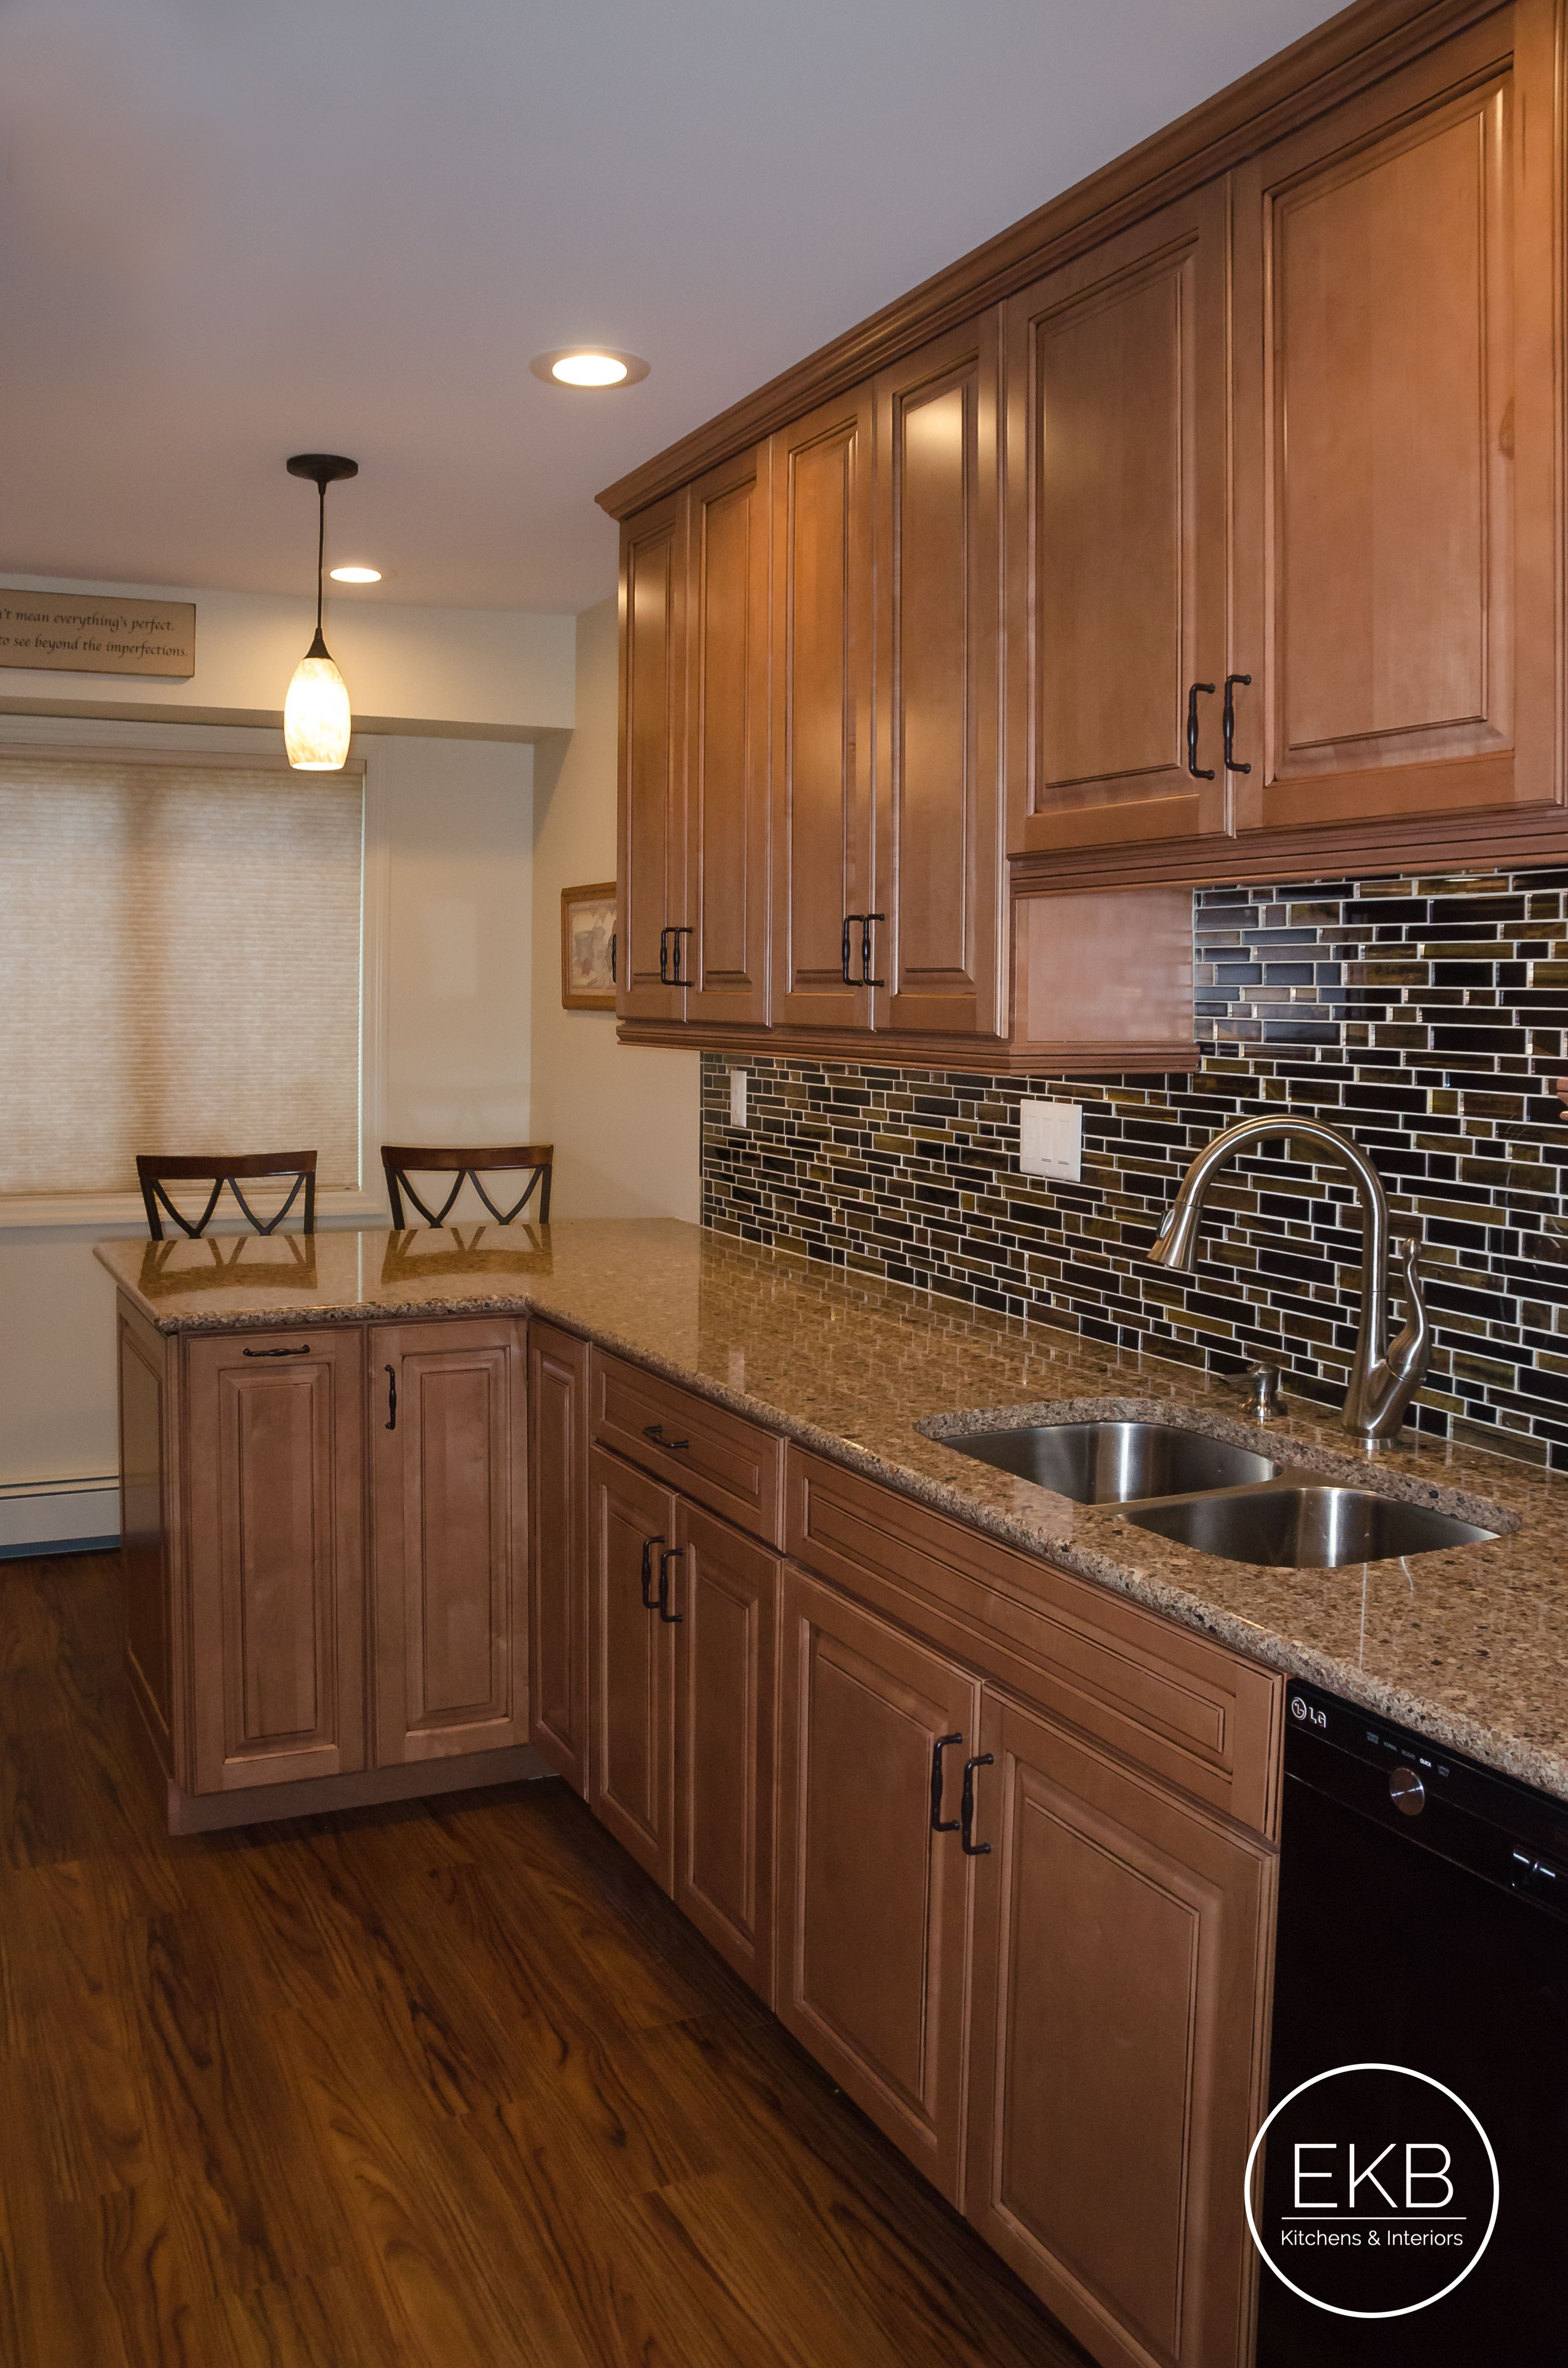 Waypoint 660r Maple Mocha Countertops Are Silestone Siena Ridge Kitchen Design Installing Kitchen Cabinets Kitchen Remodel